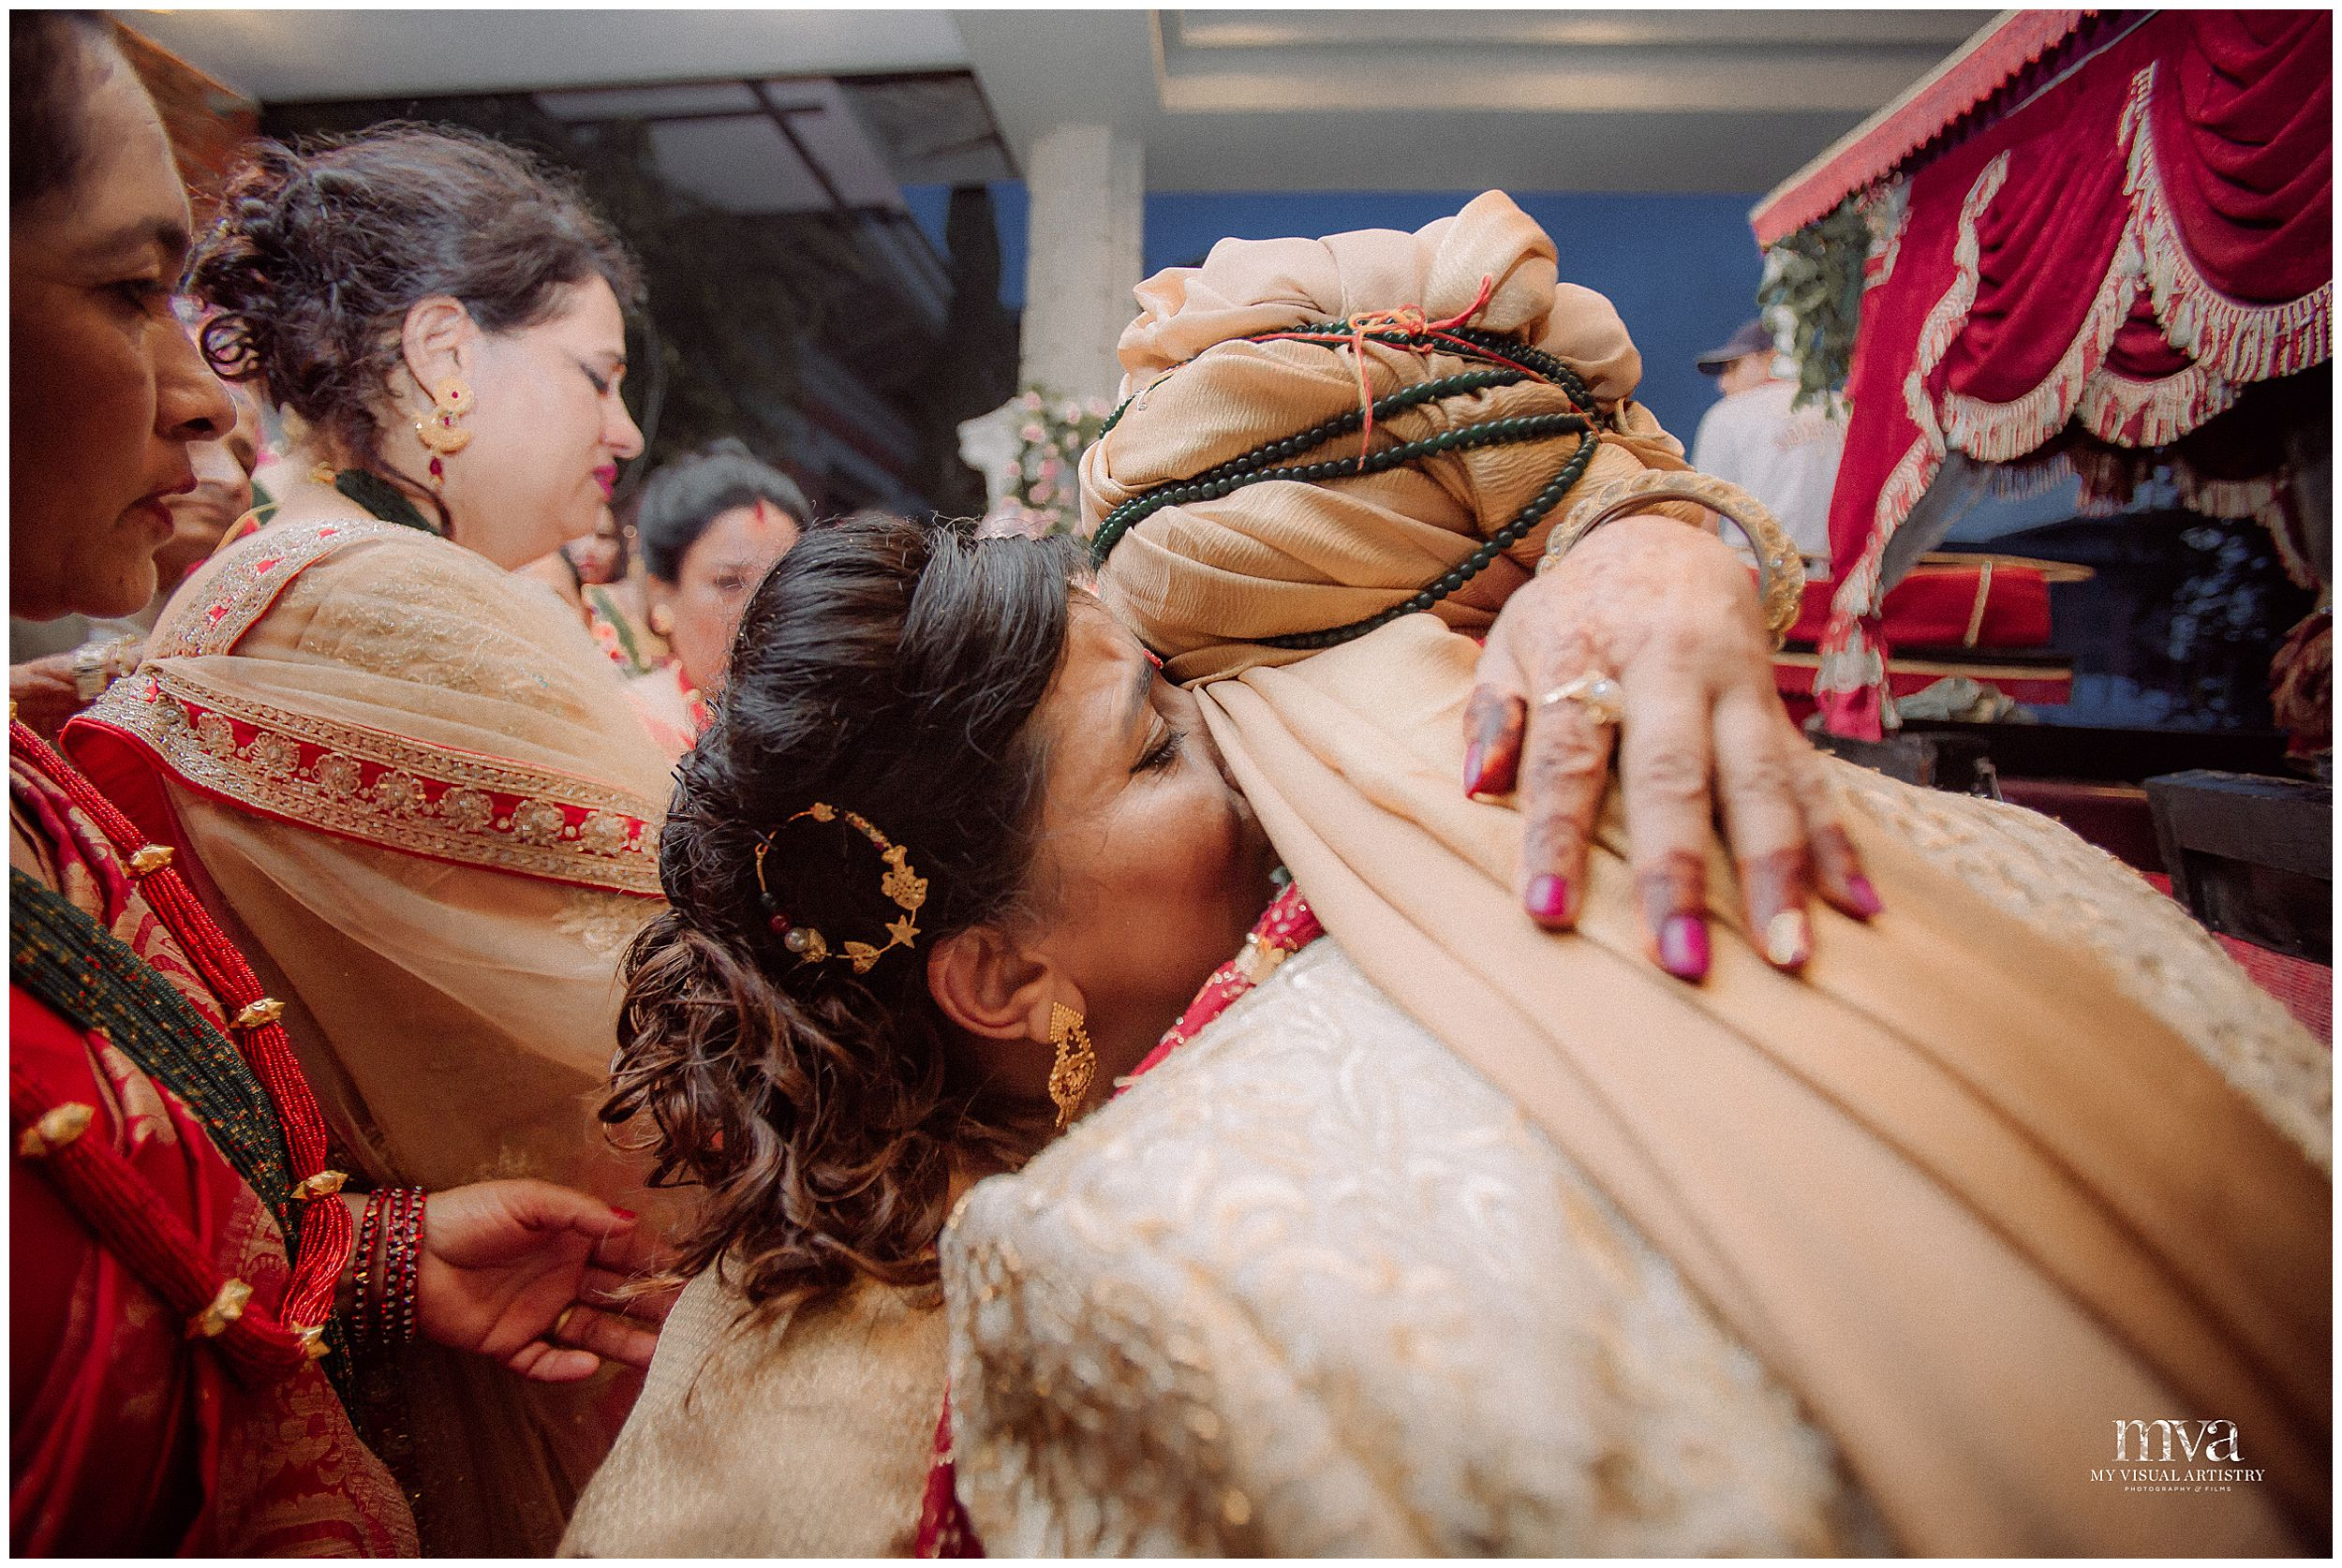 SONAAL_AMI_MYVISUALARTISTRY_WEDDING_PHOTOGRAPHY_MVA_NEPAL_KATHMANDU_SOALTEE73.jpg